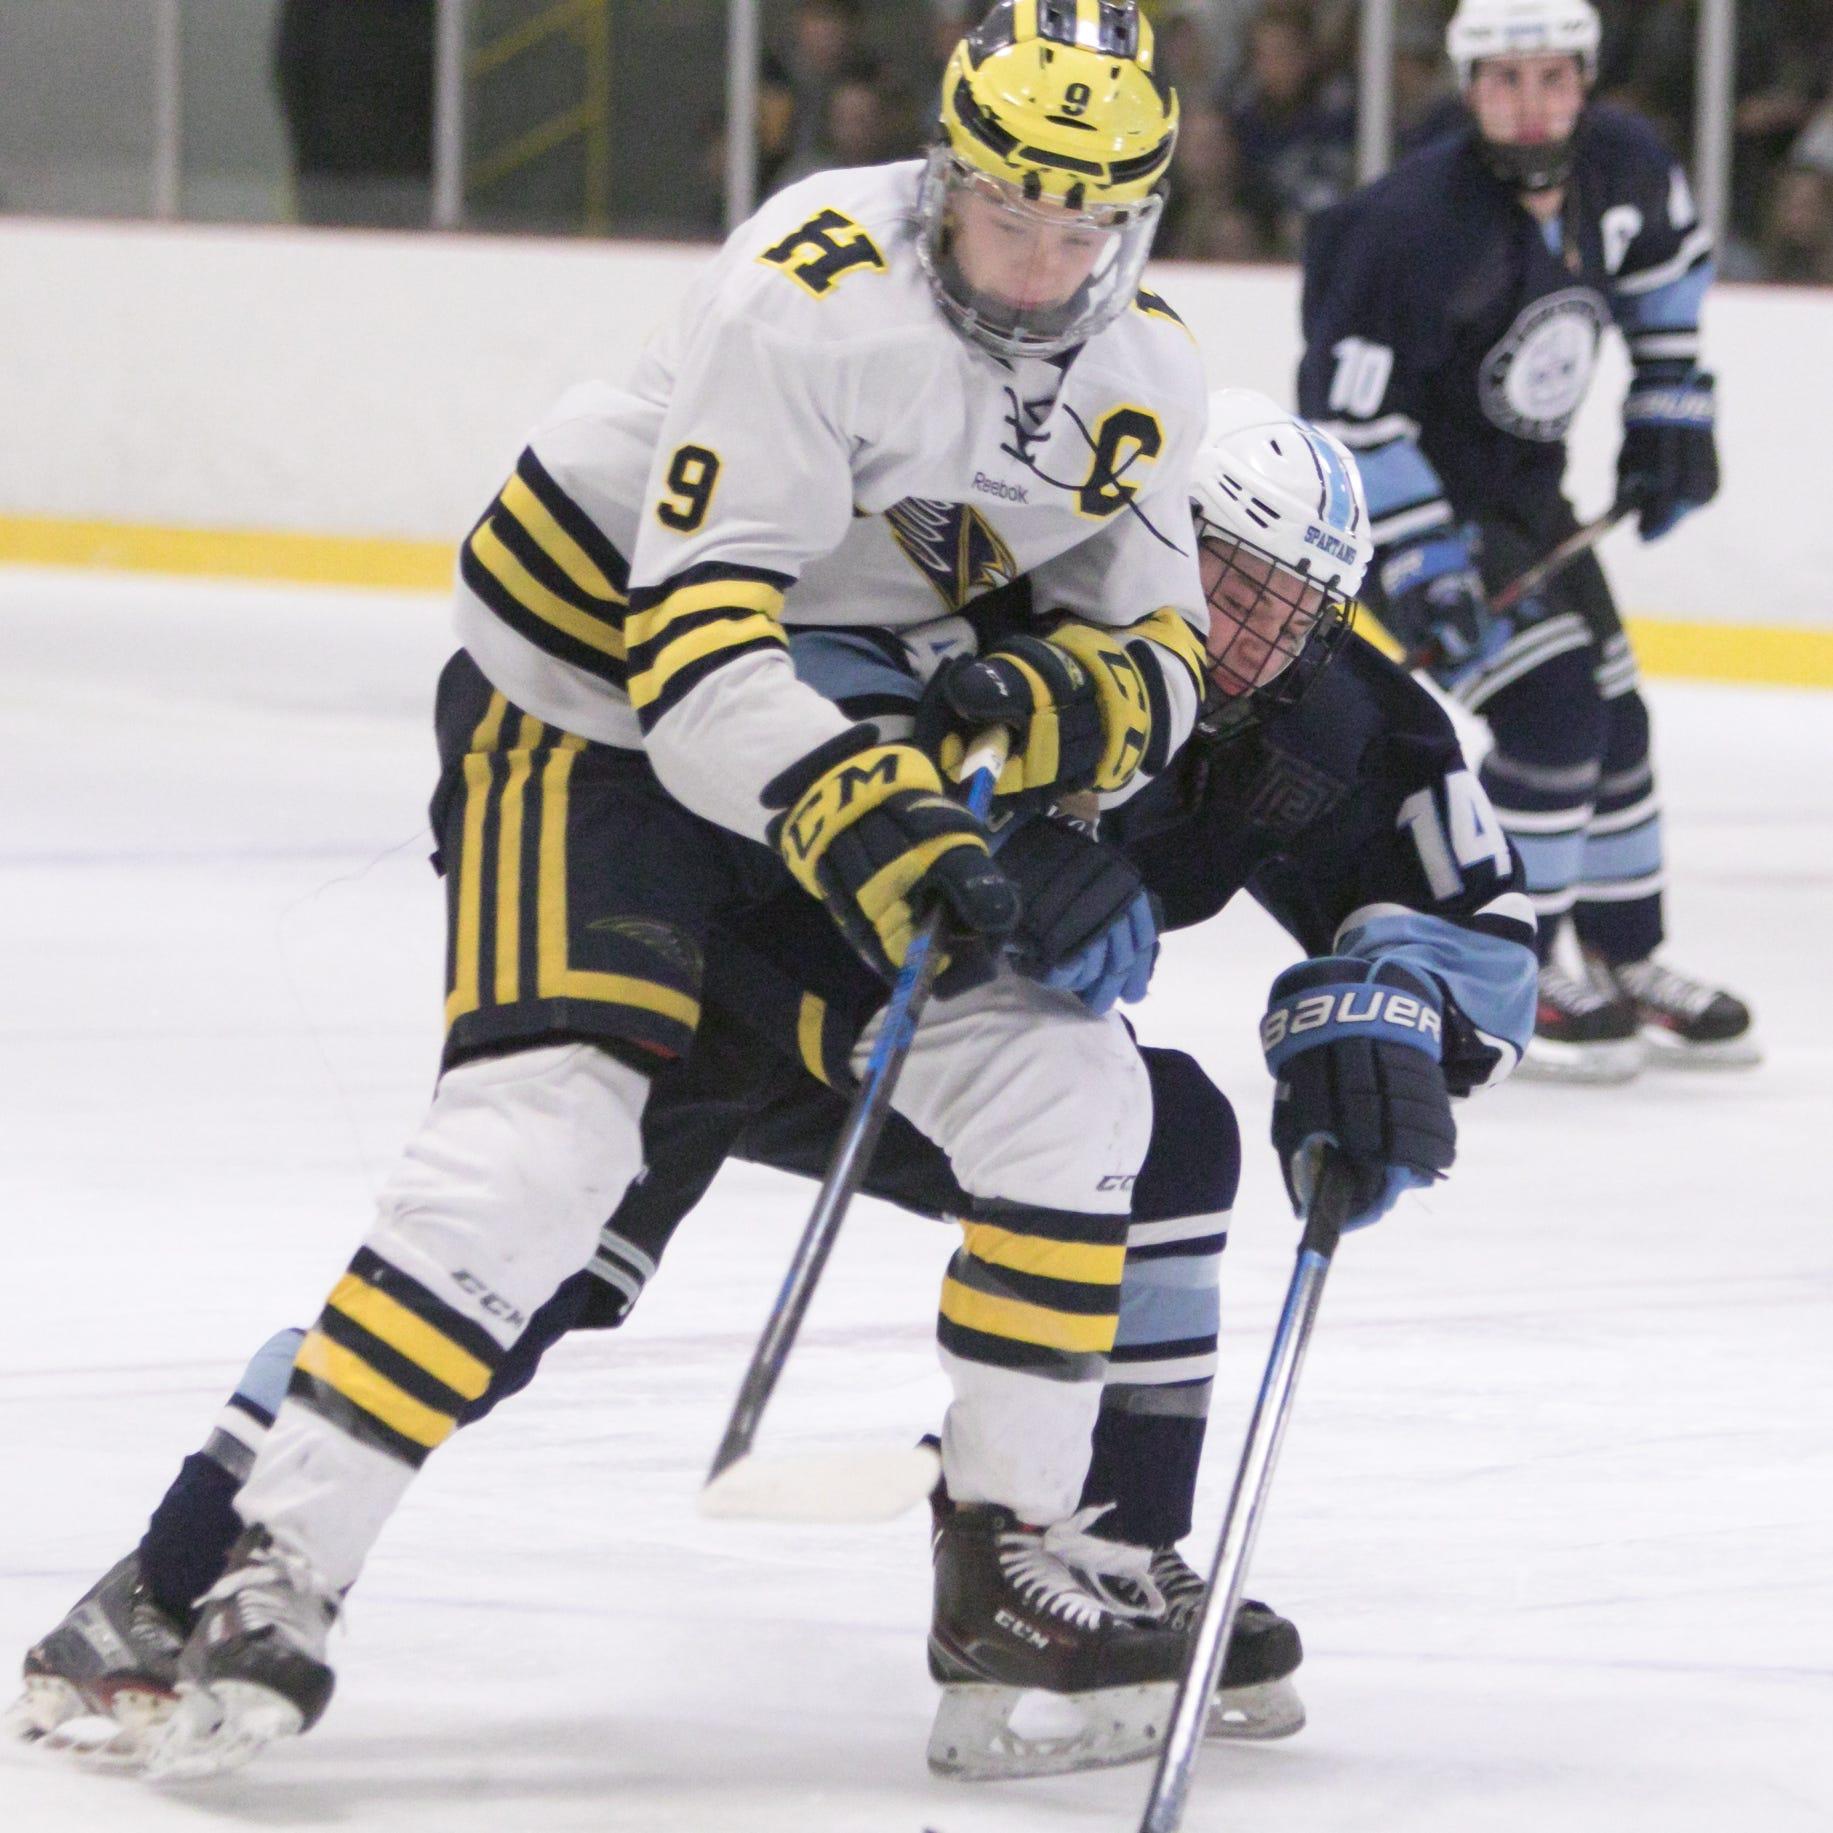 And your Mr. Hockey winner is ... Hartland's Joey Larson